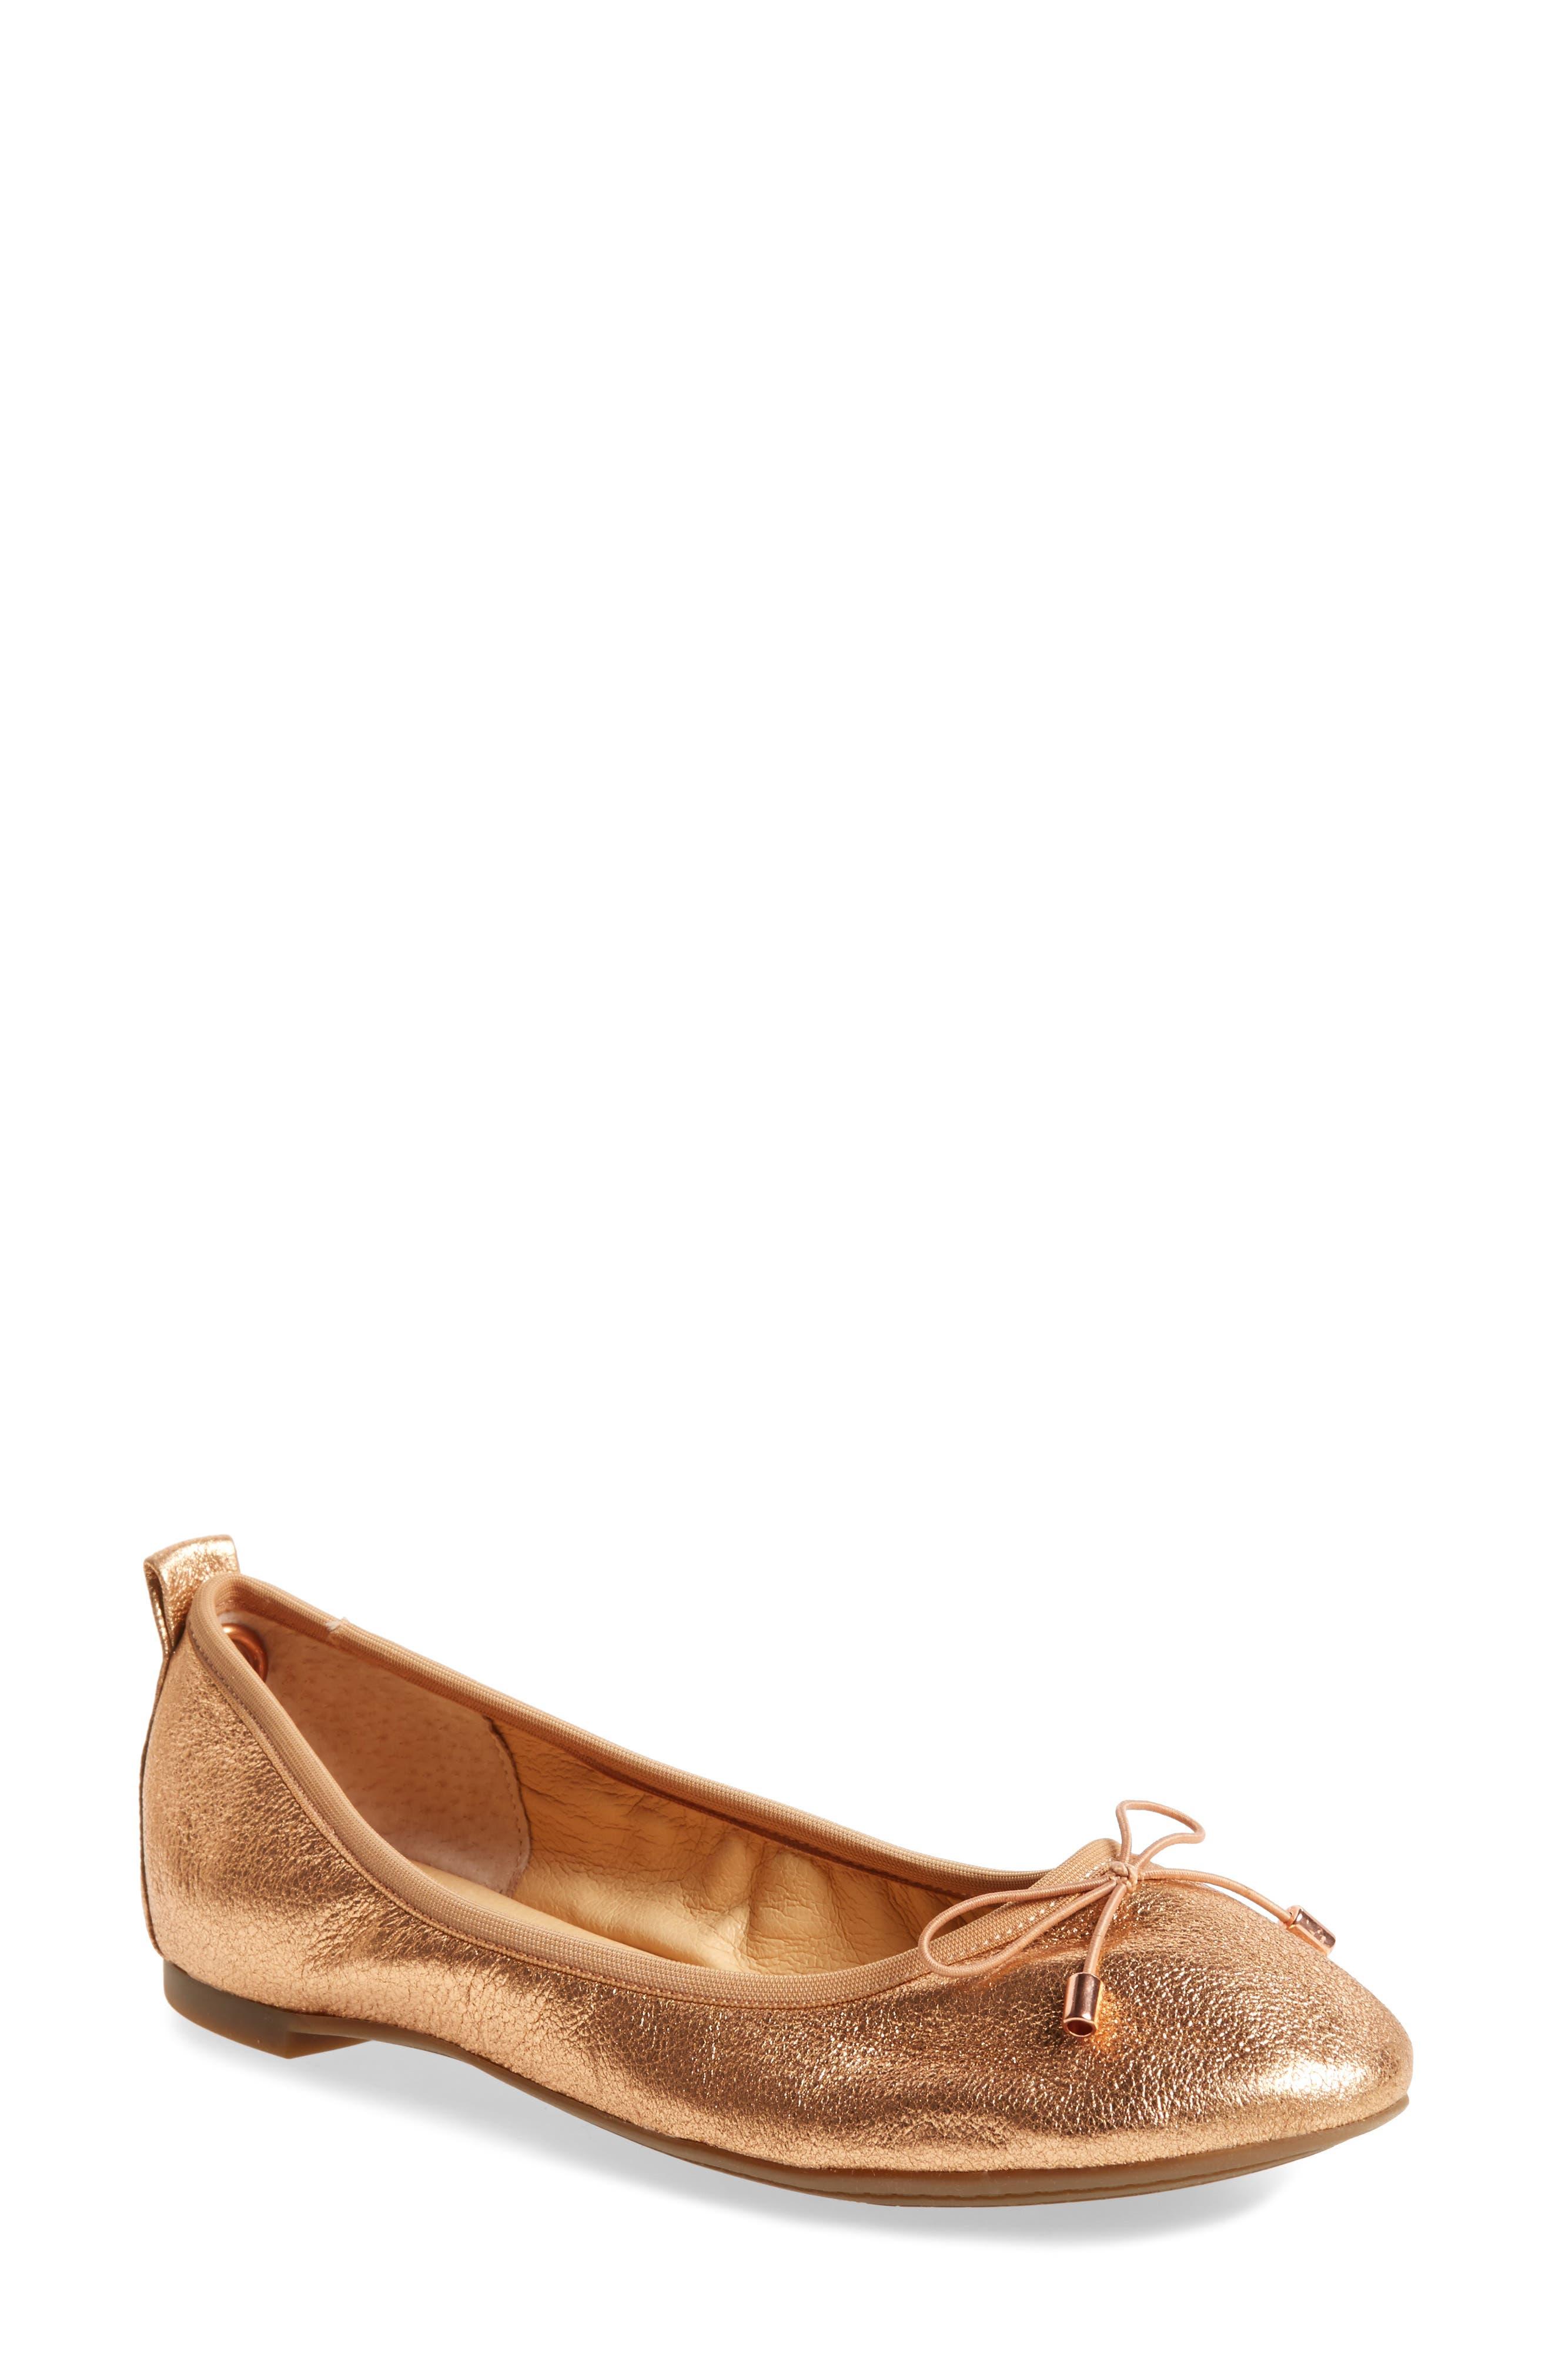 Alternate Image 1 Selected - Jessica Simpson Nalan Ballet Flat (Women)